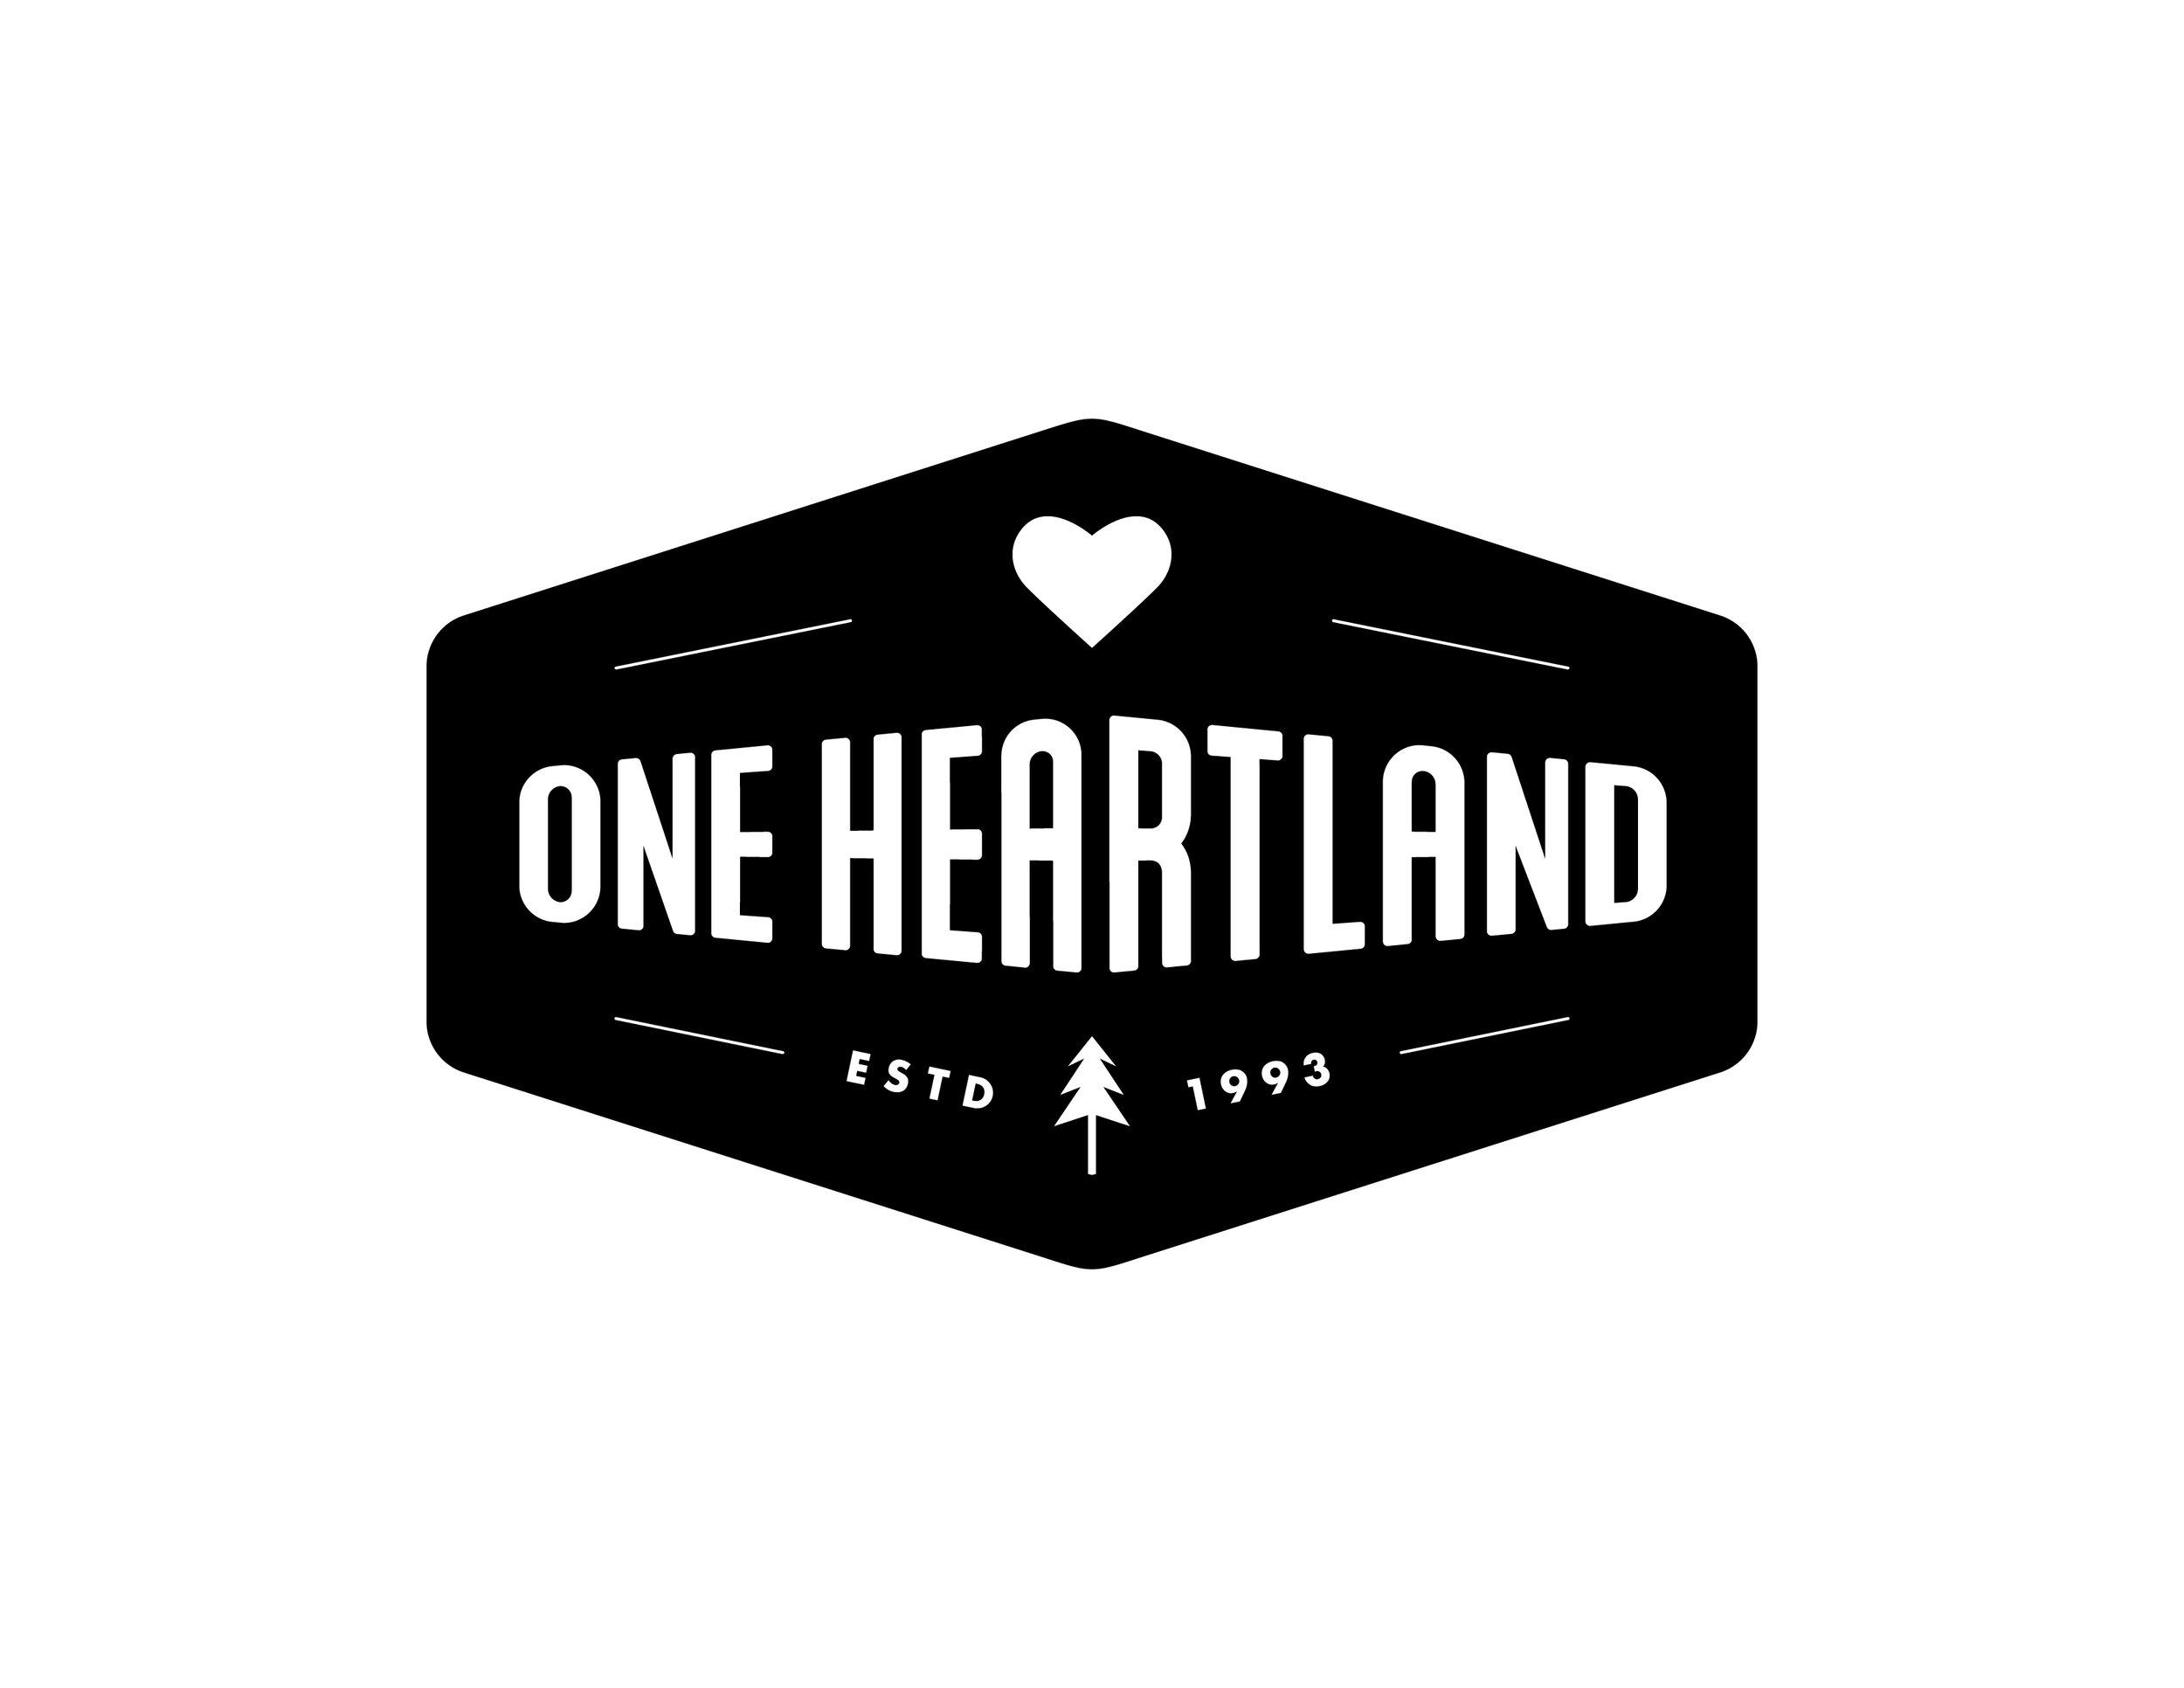 OneHeartland_Logo fb prof.jpg